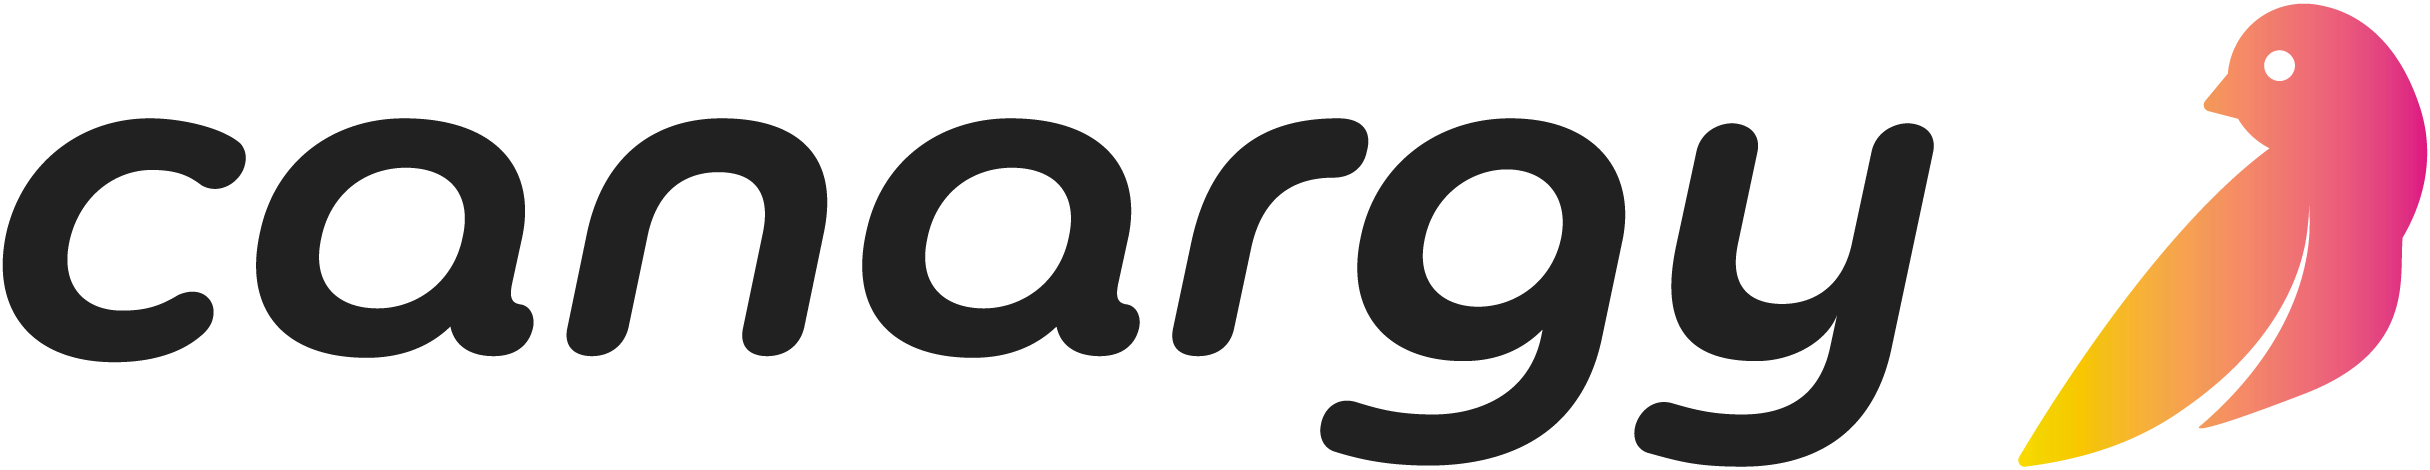 Canargy